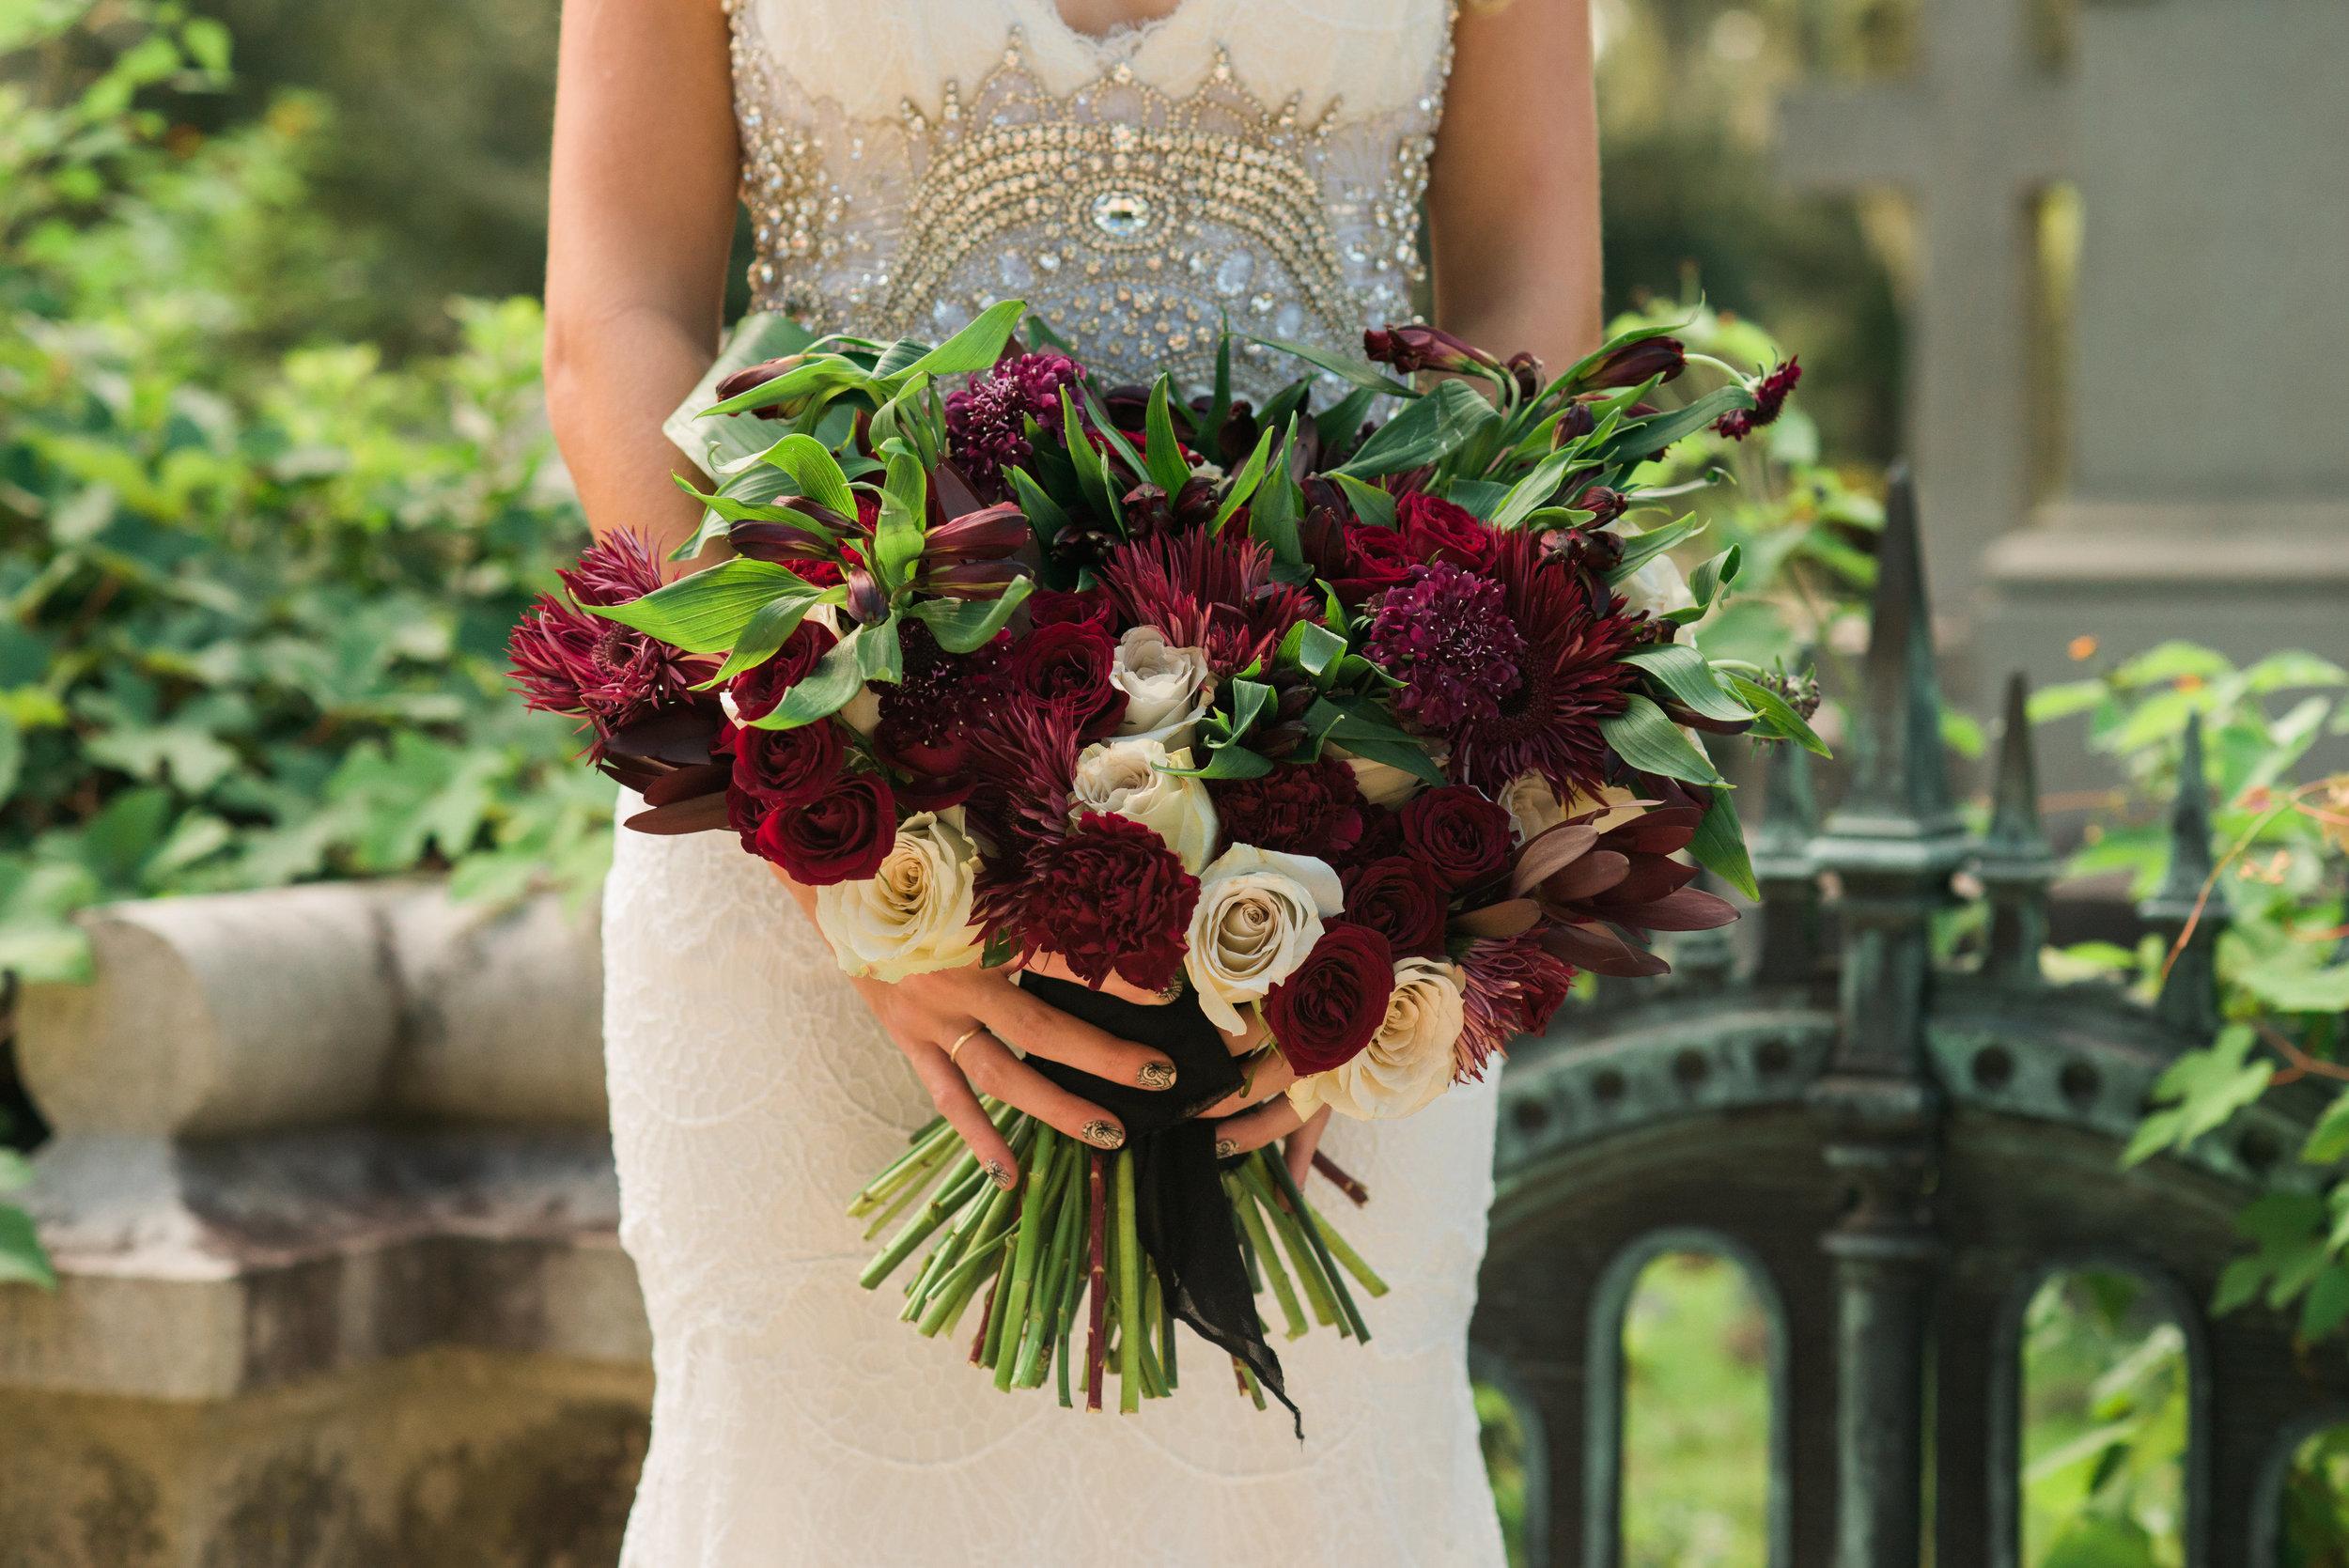 callie-beale-photography-Bonaventure-cemetery-michelle-royal-makeup-cemetery-wedding-ivory-and-beau-wedding-planning-anna-campbell-harper-savannah-bridal-boutique-savannah-wedding-dresses-savannah-weddings-9.jpg